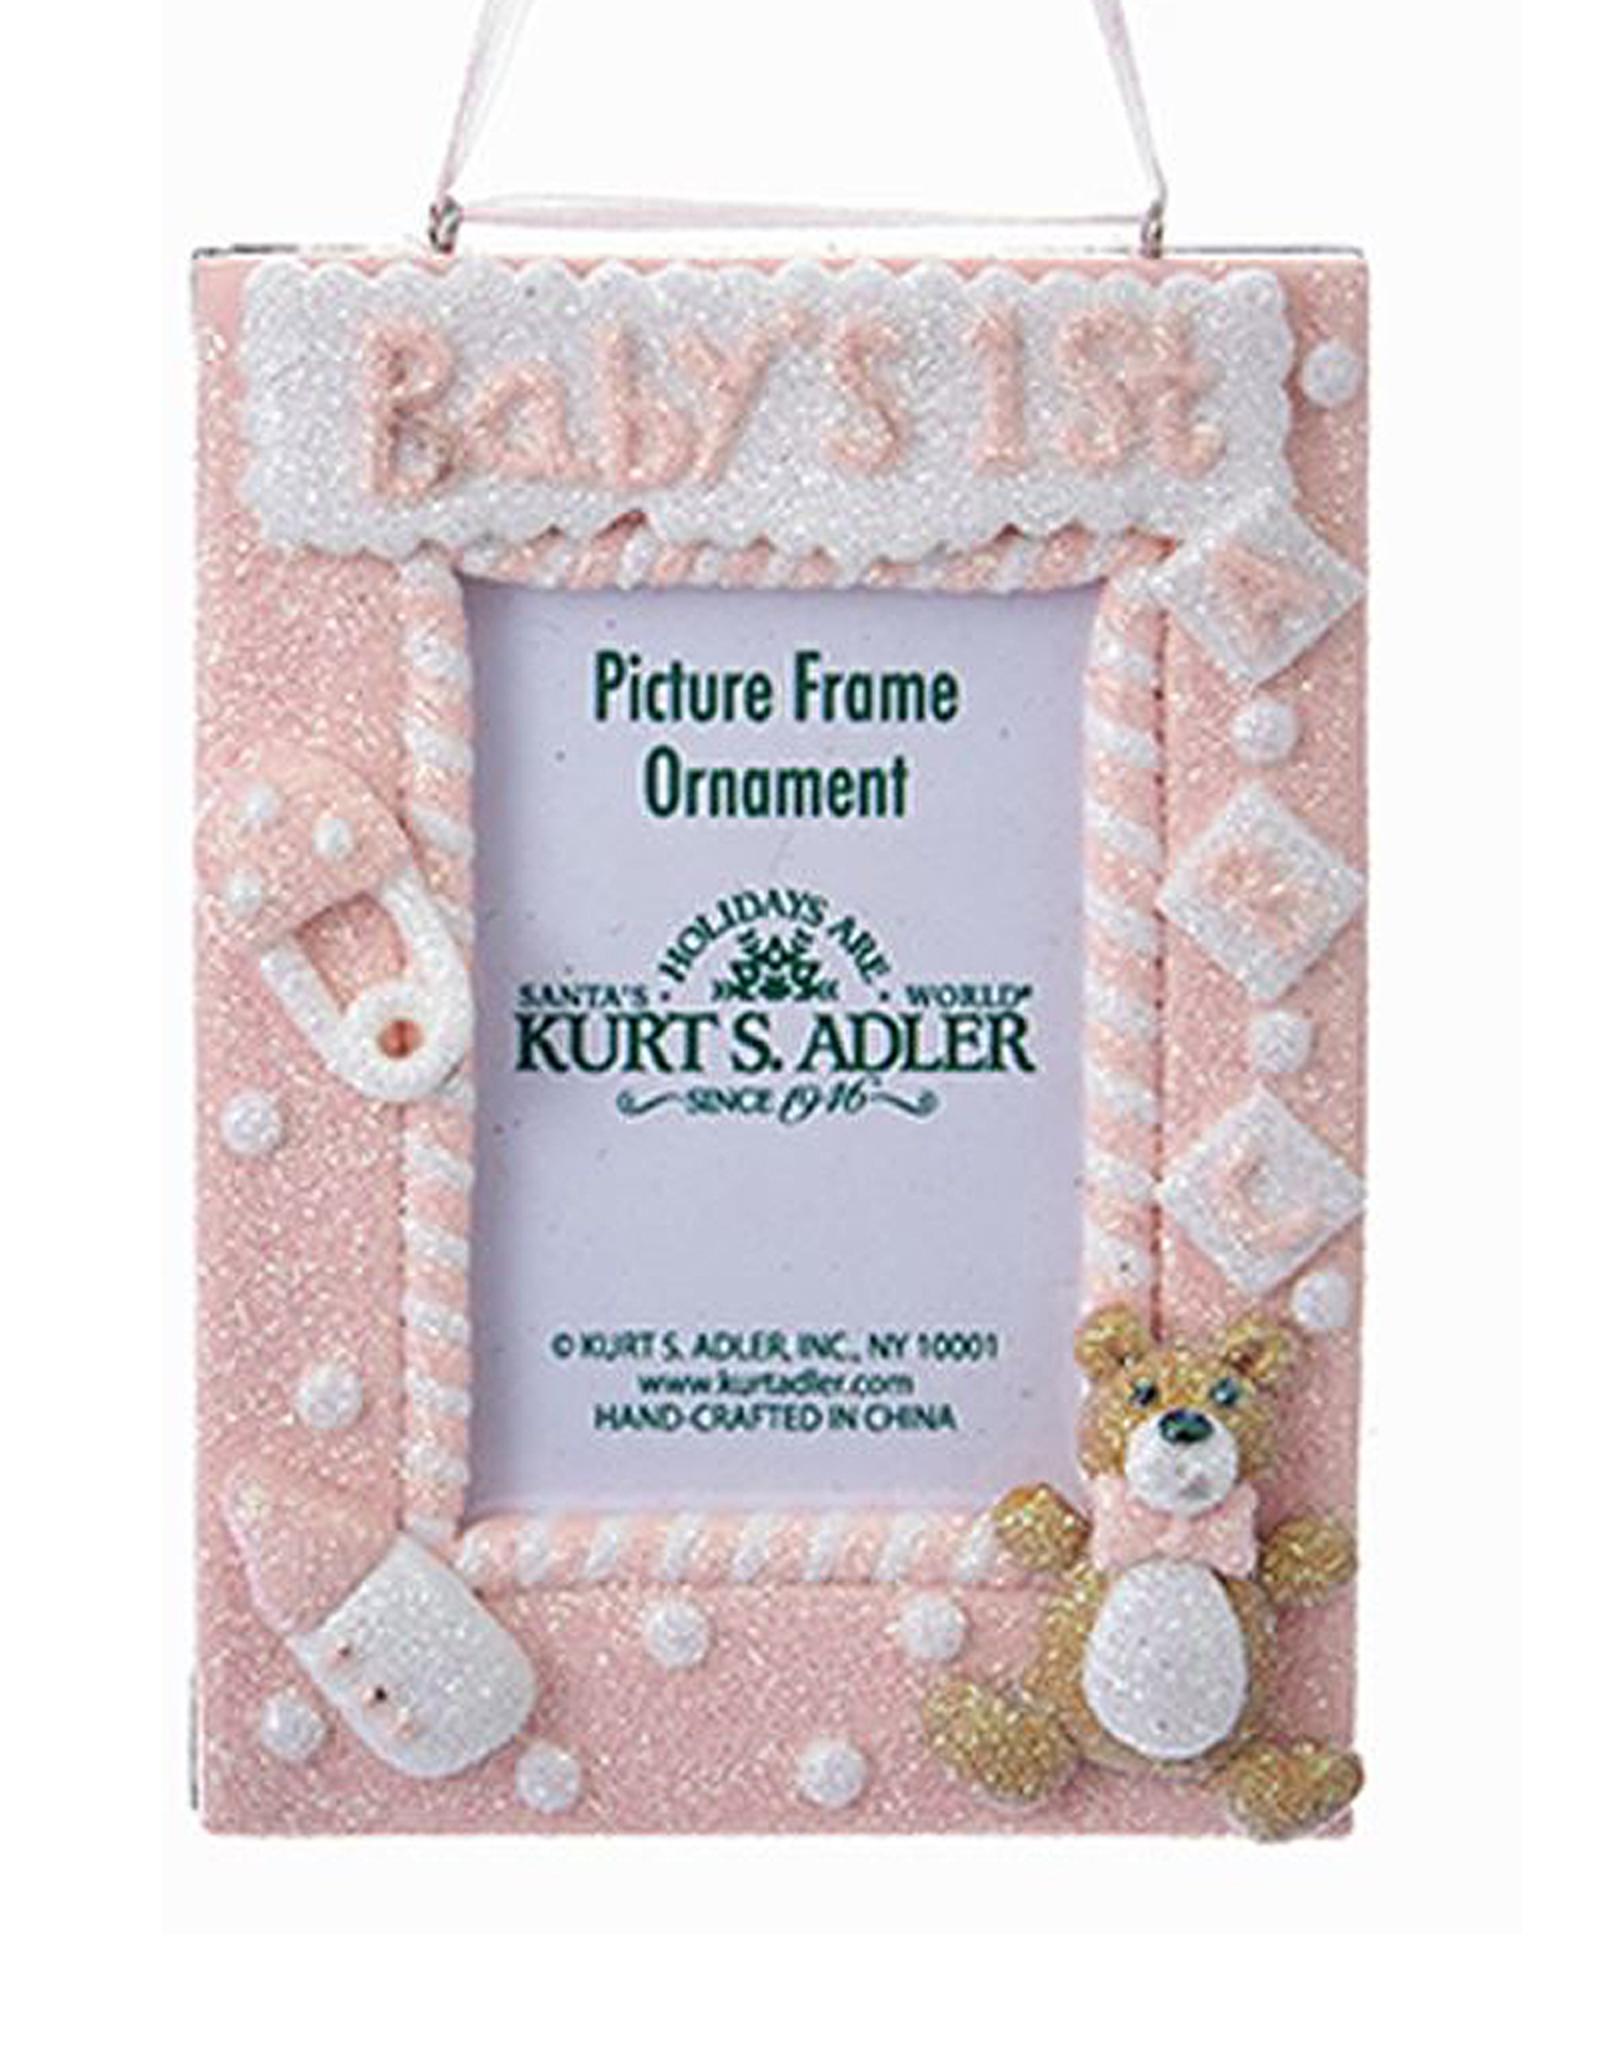 Kurt Adler Babys First Frame Christmas Ornament - Pink